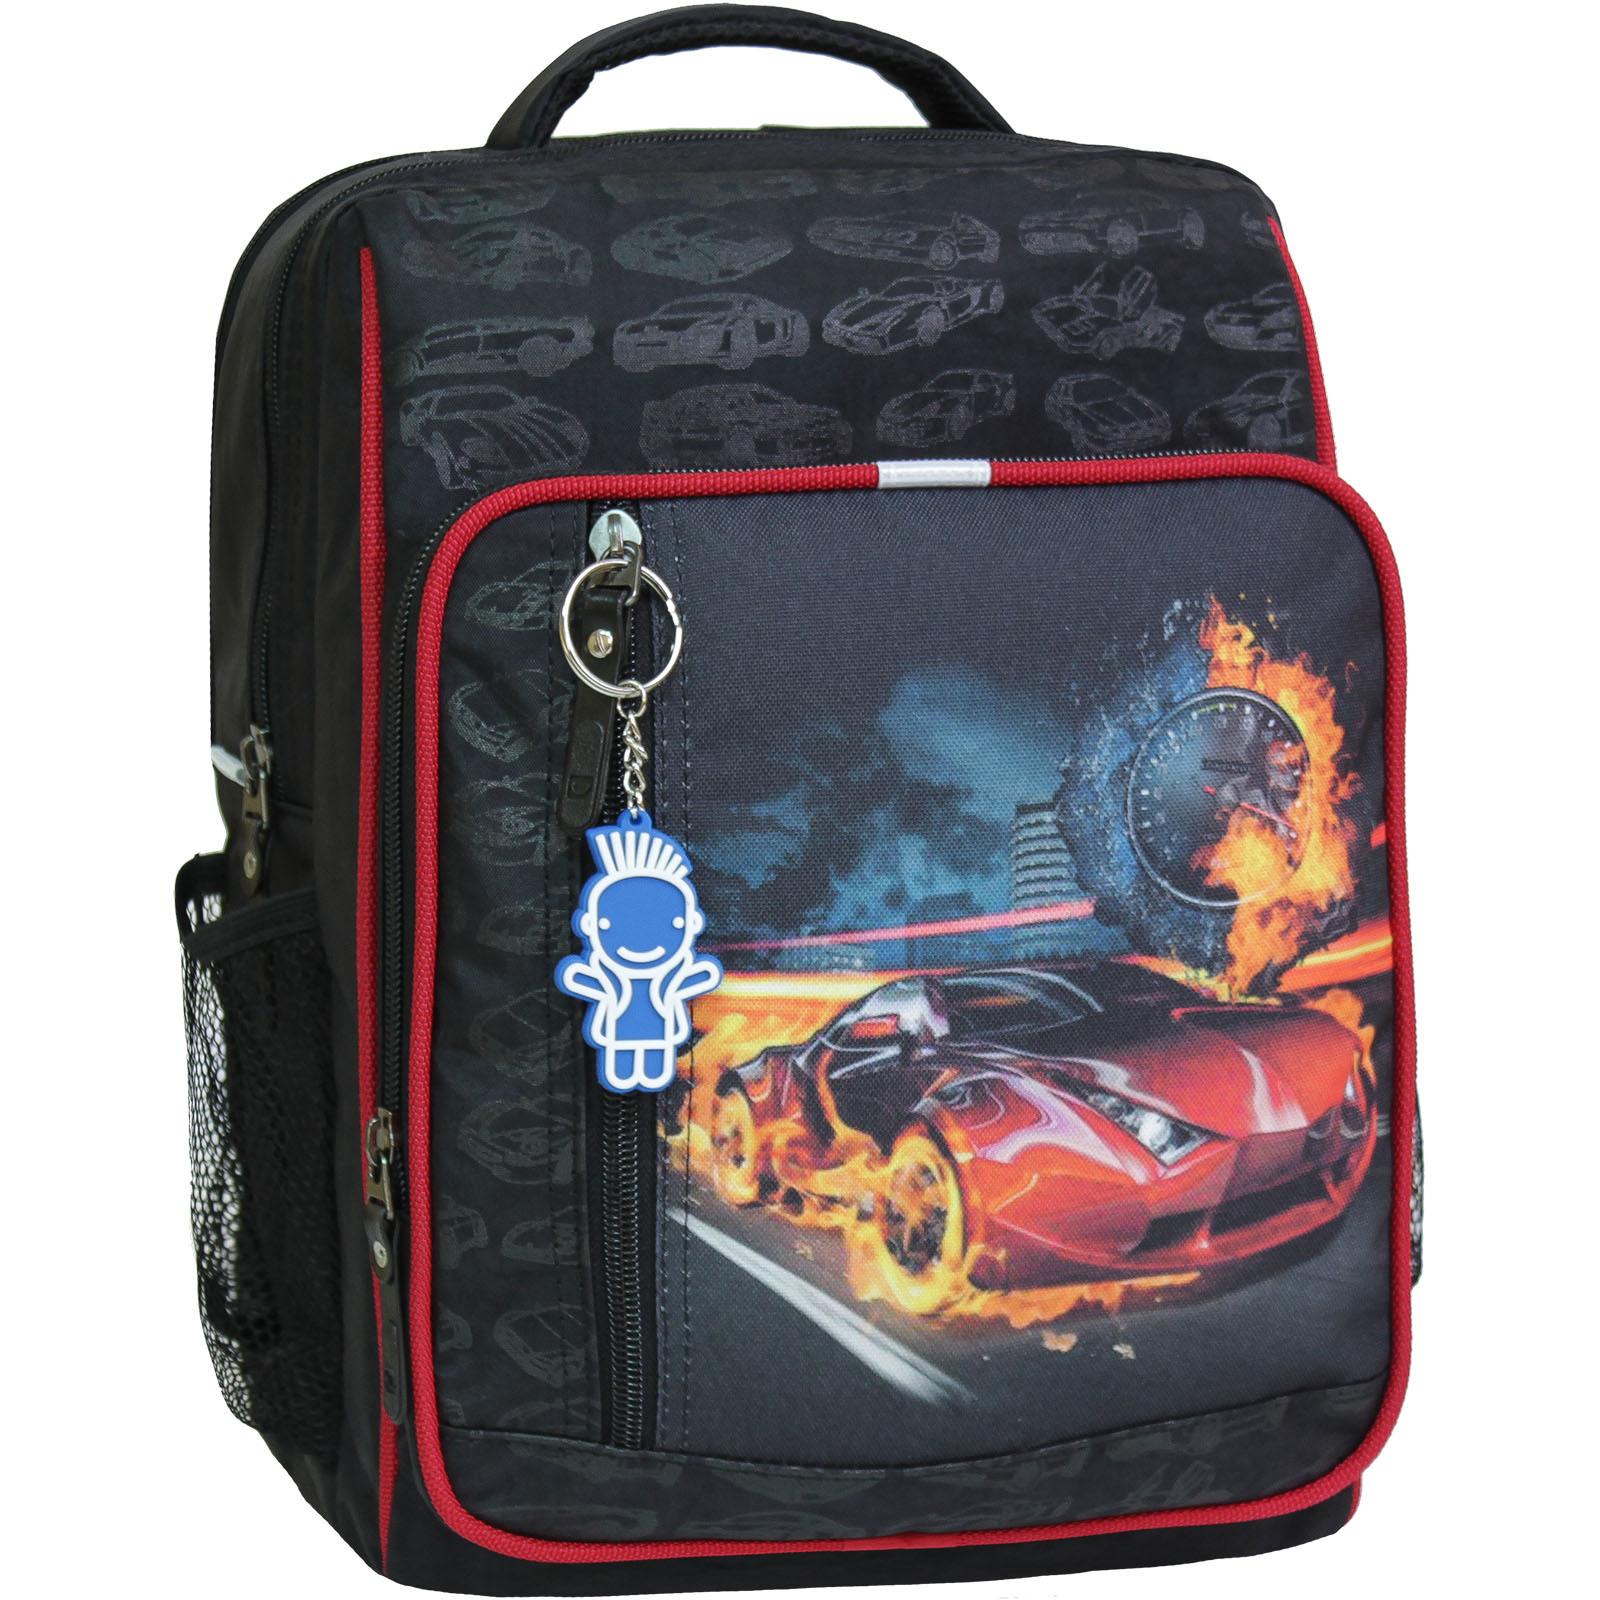 Школьные рюкзаки Рюкзак школьный Bagland Школьник 8 л. Черный (машина 23) (00112702) IMG_8290-1600.jpg